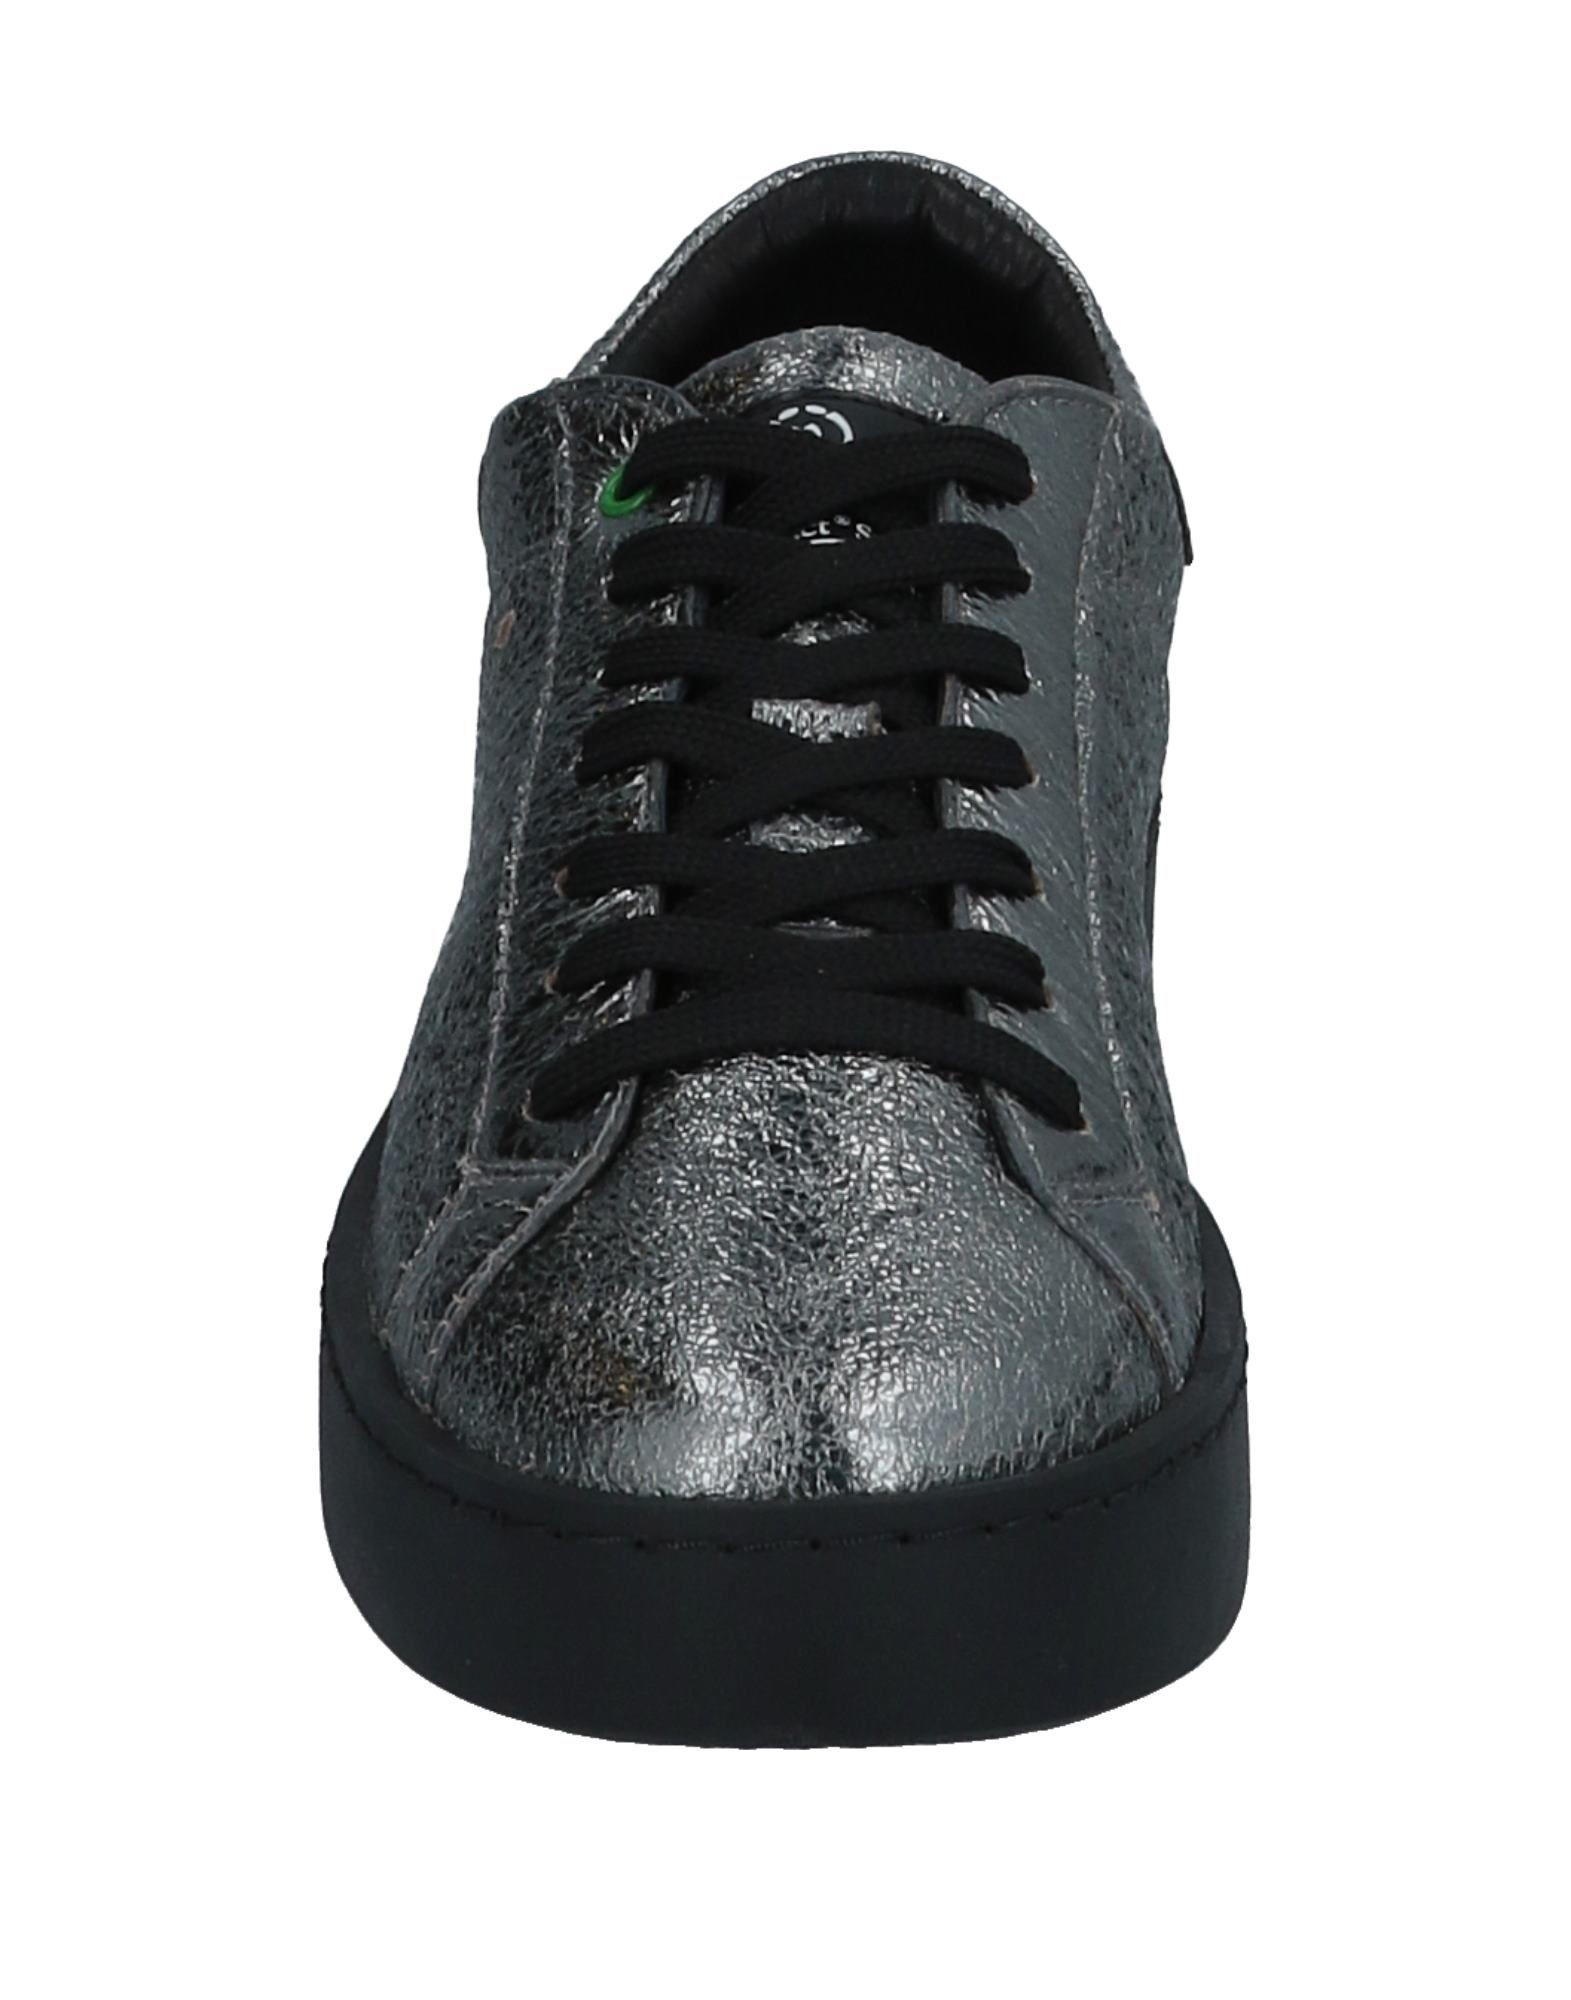 Womsh Sneakers Damen Gutes Preis-Leistungs-Verhältnis, Preis-Leistungs-Verhältnis, Preis-Leistungs-Verhältnis, es lohnt sich 2973cb